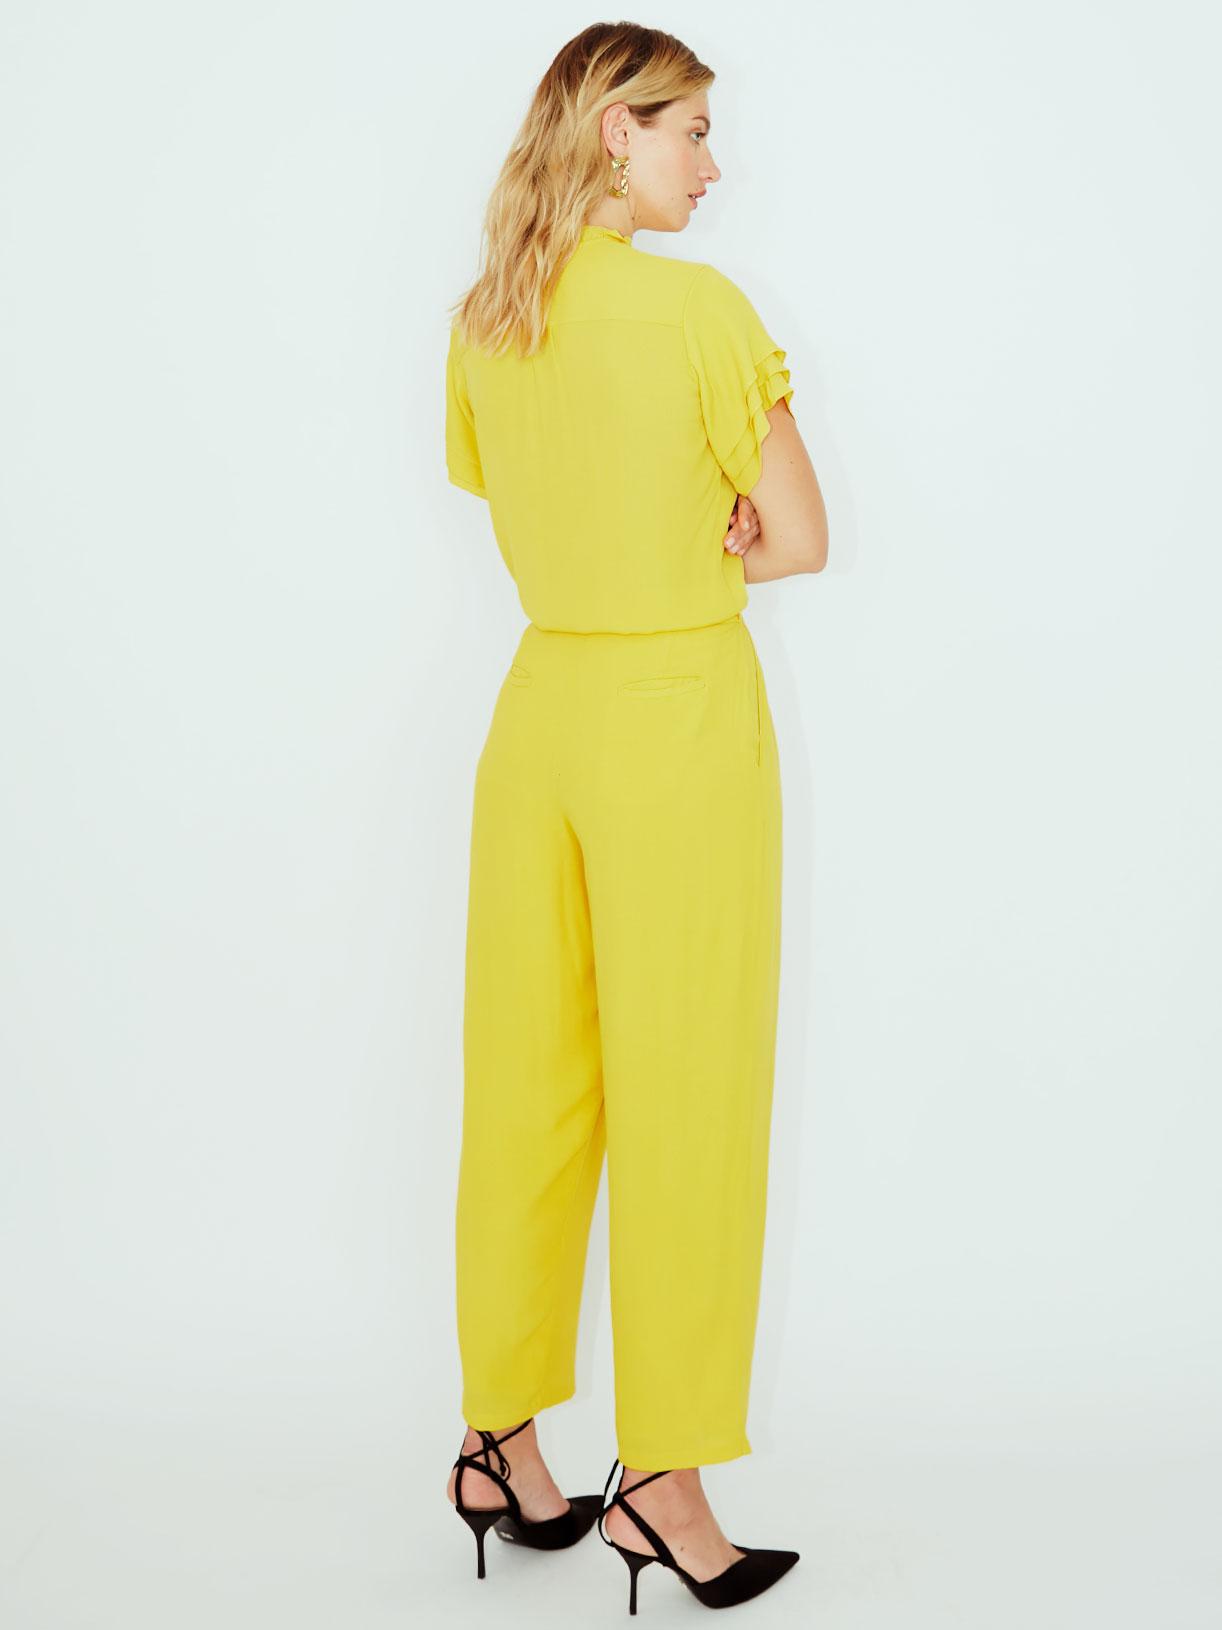 Pantalon carotte large vegan jaune ecoresponsable - Myphilosophy